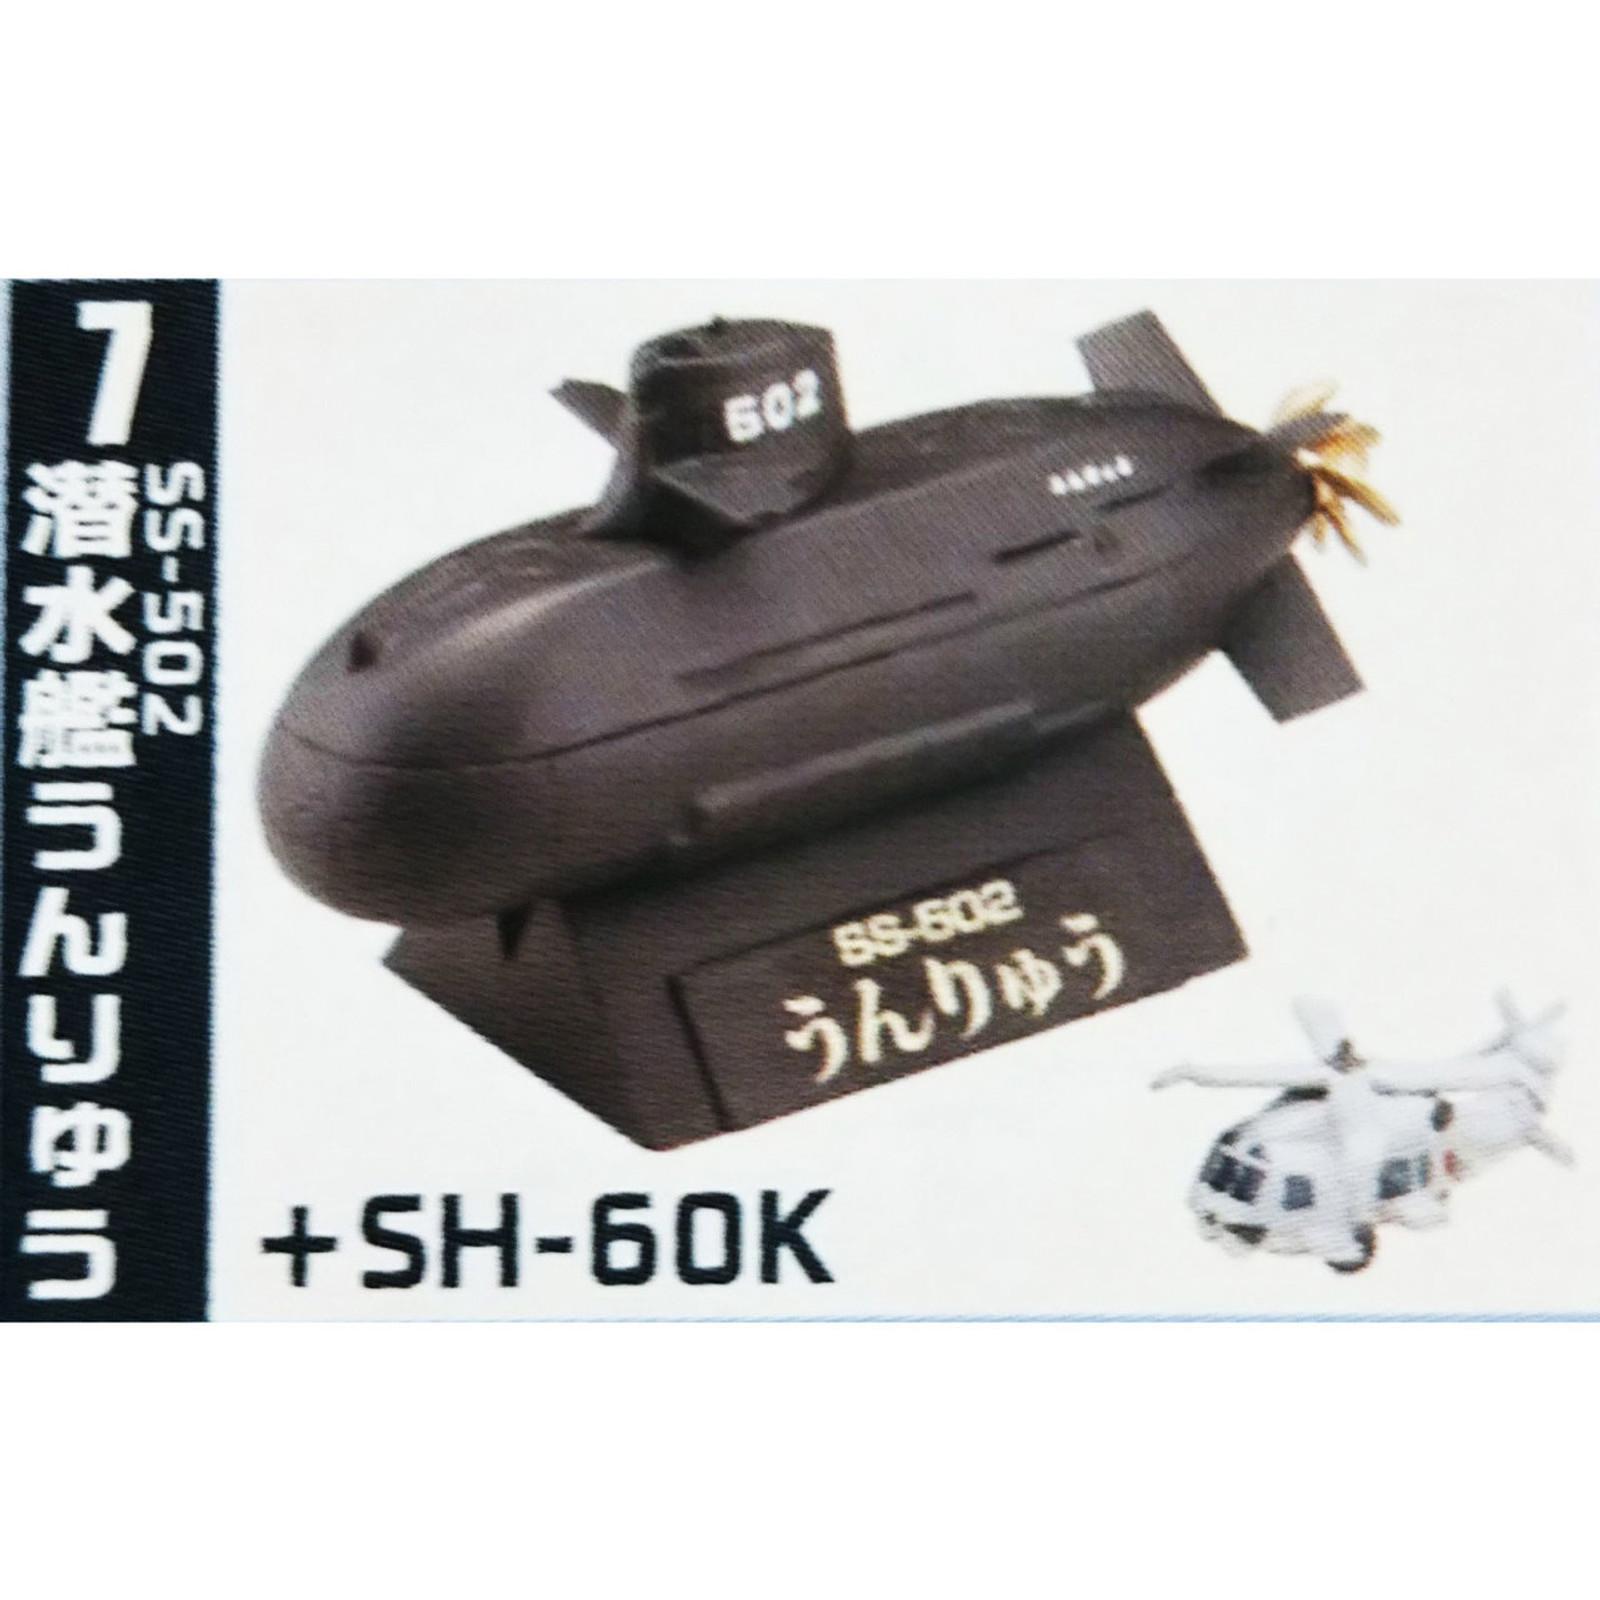 Chibi Scale Submarine Unryu Type SS-502 +SH-60K Miniature Figure Kaiyodo F-Toys JAPAN